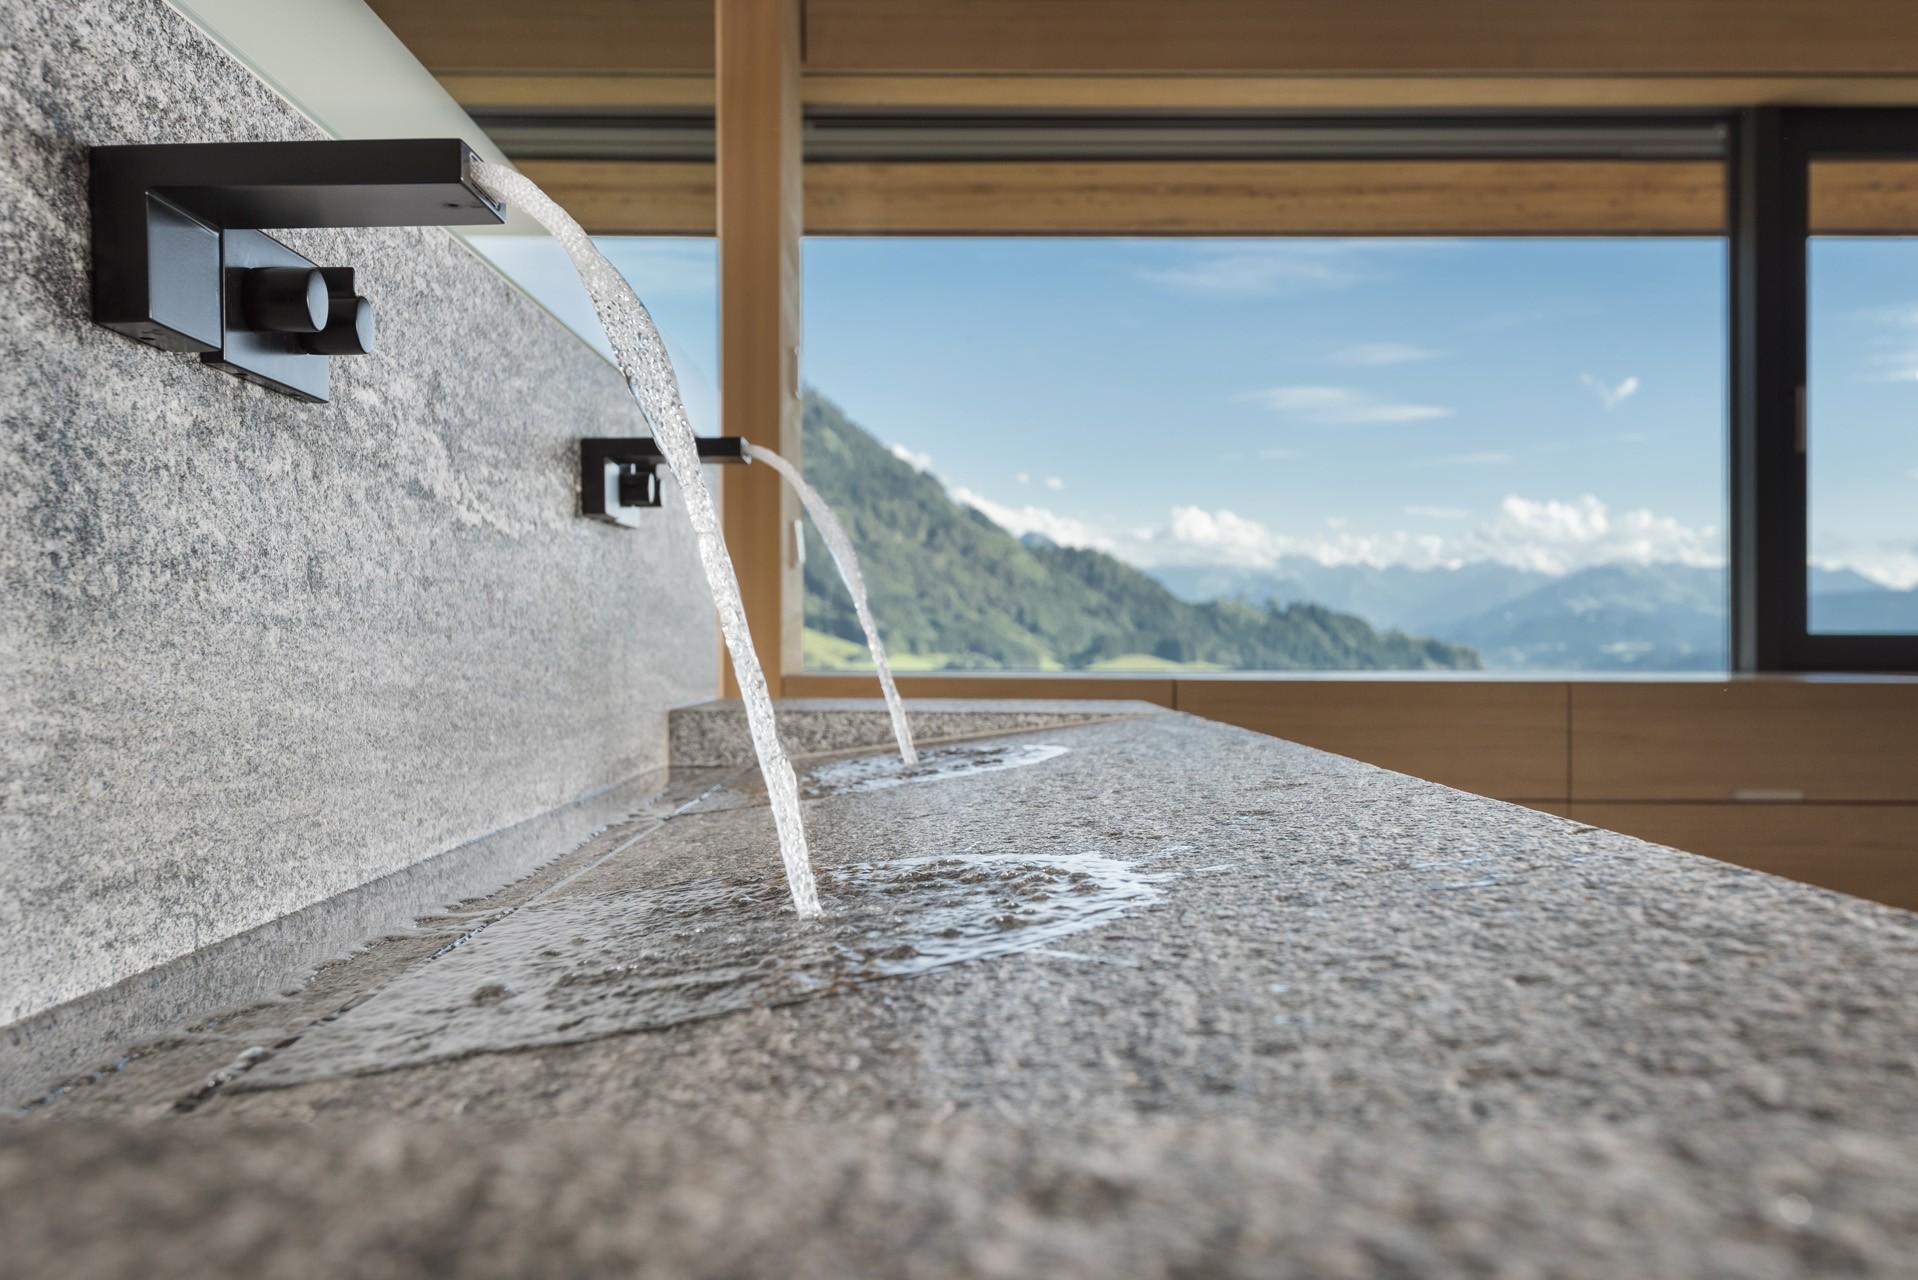 architektur-plus-raum-haus-hk-11_katego